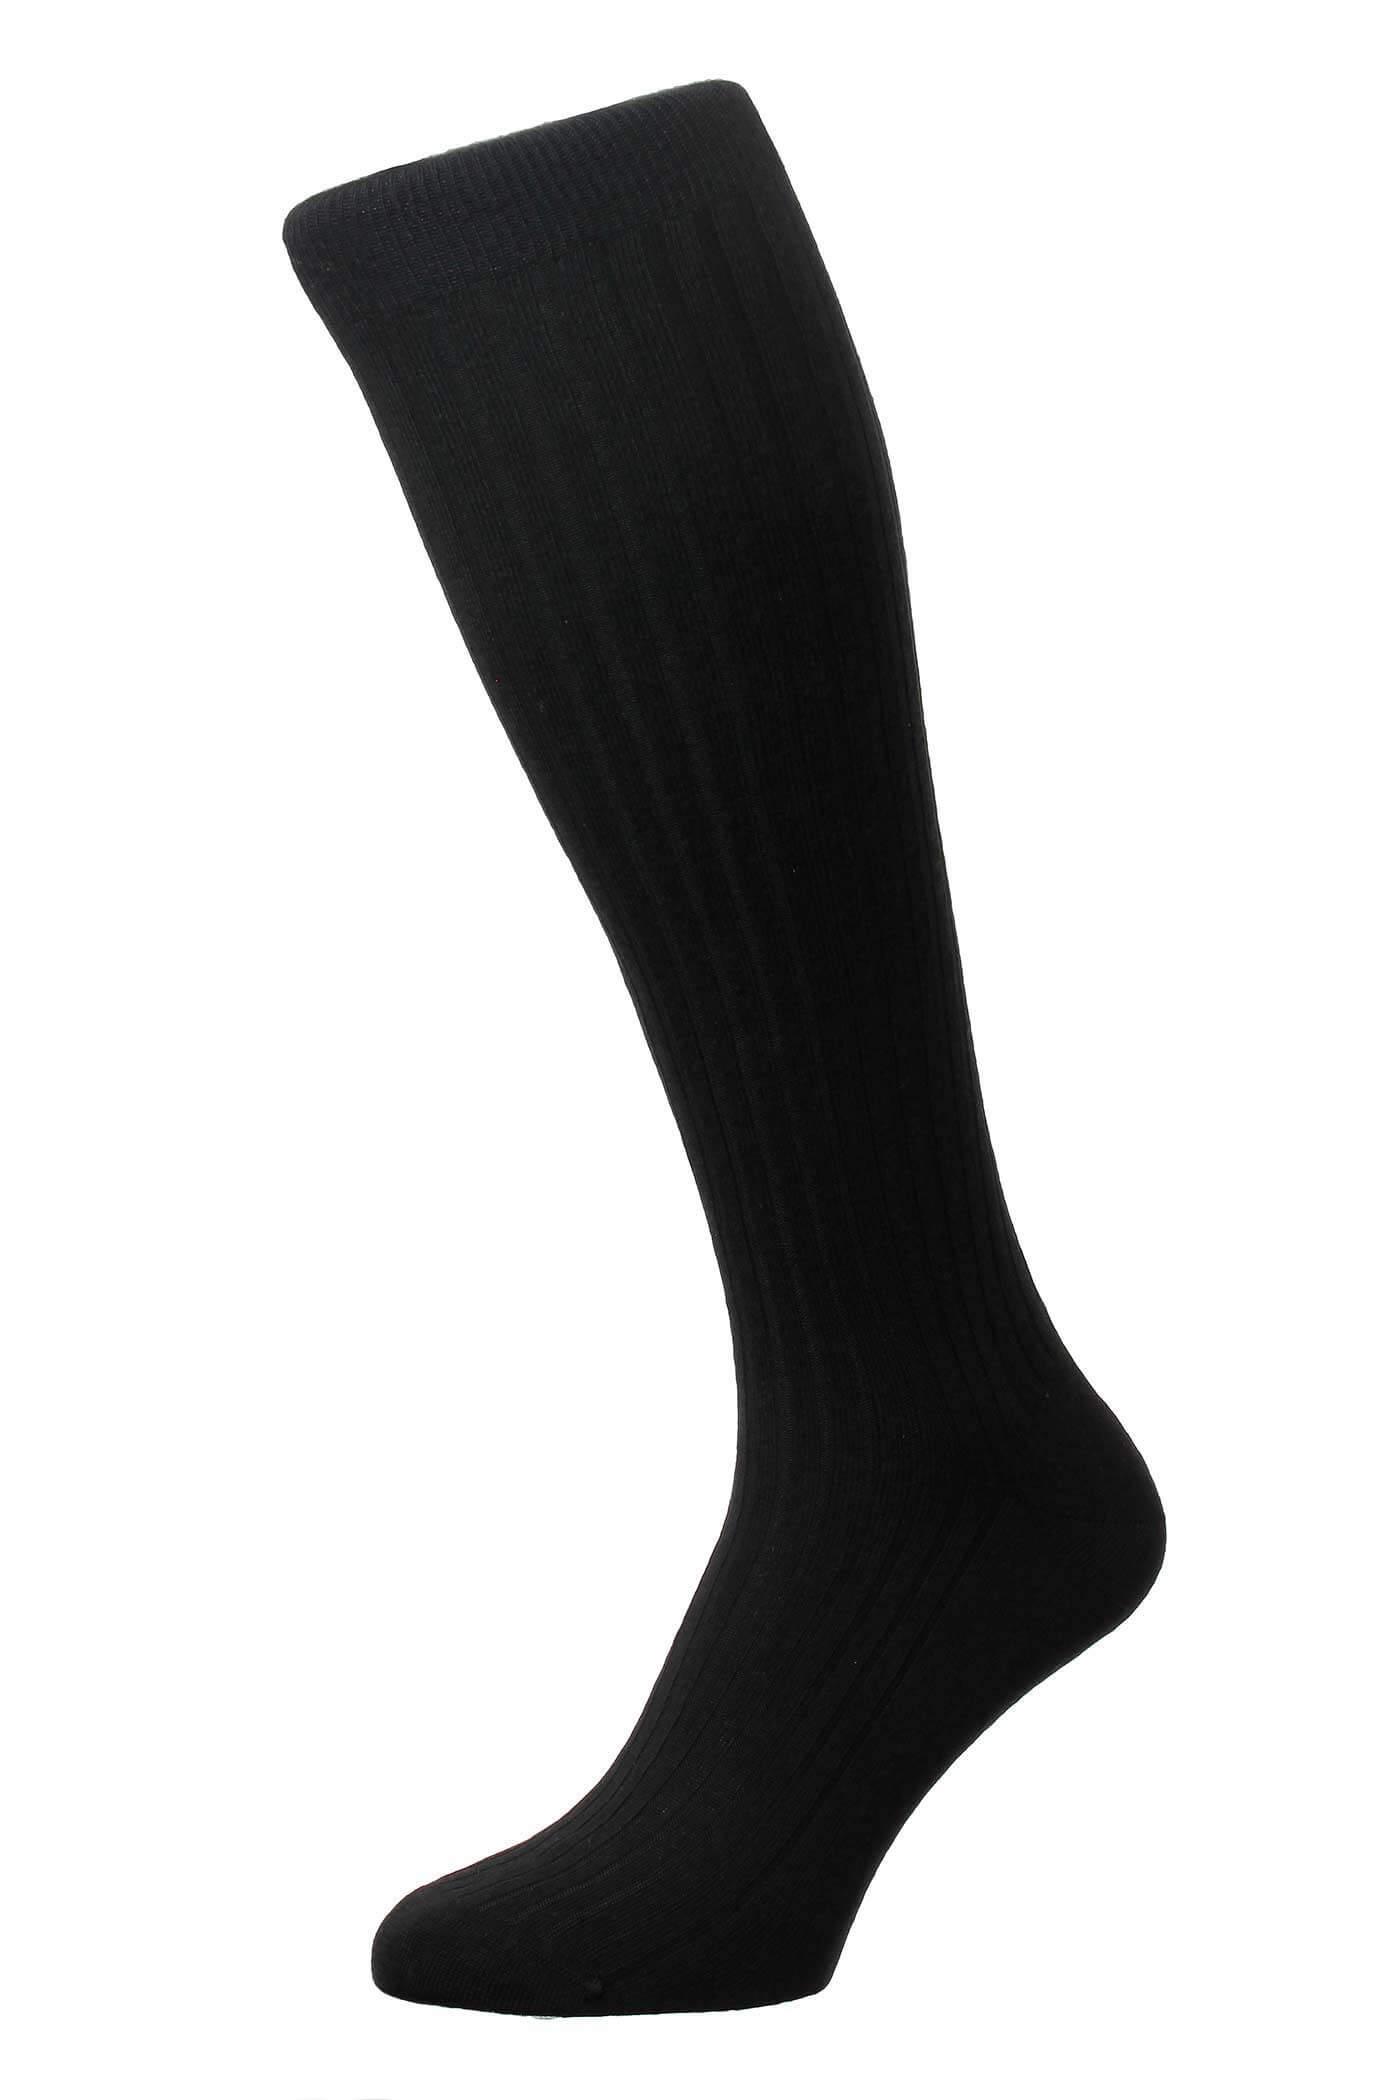 Pantherella quality socks